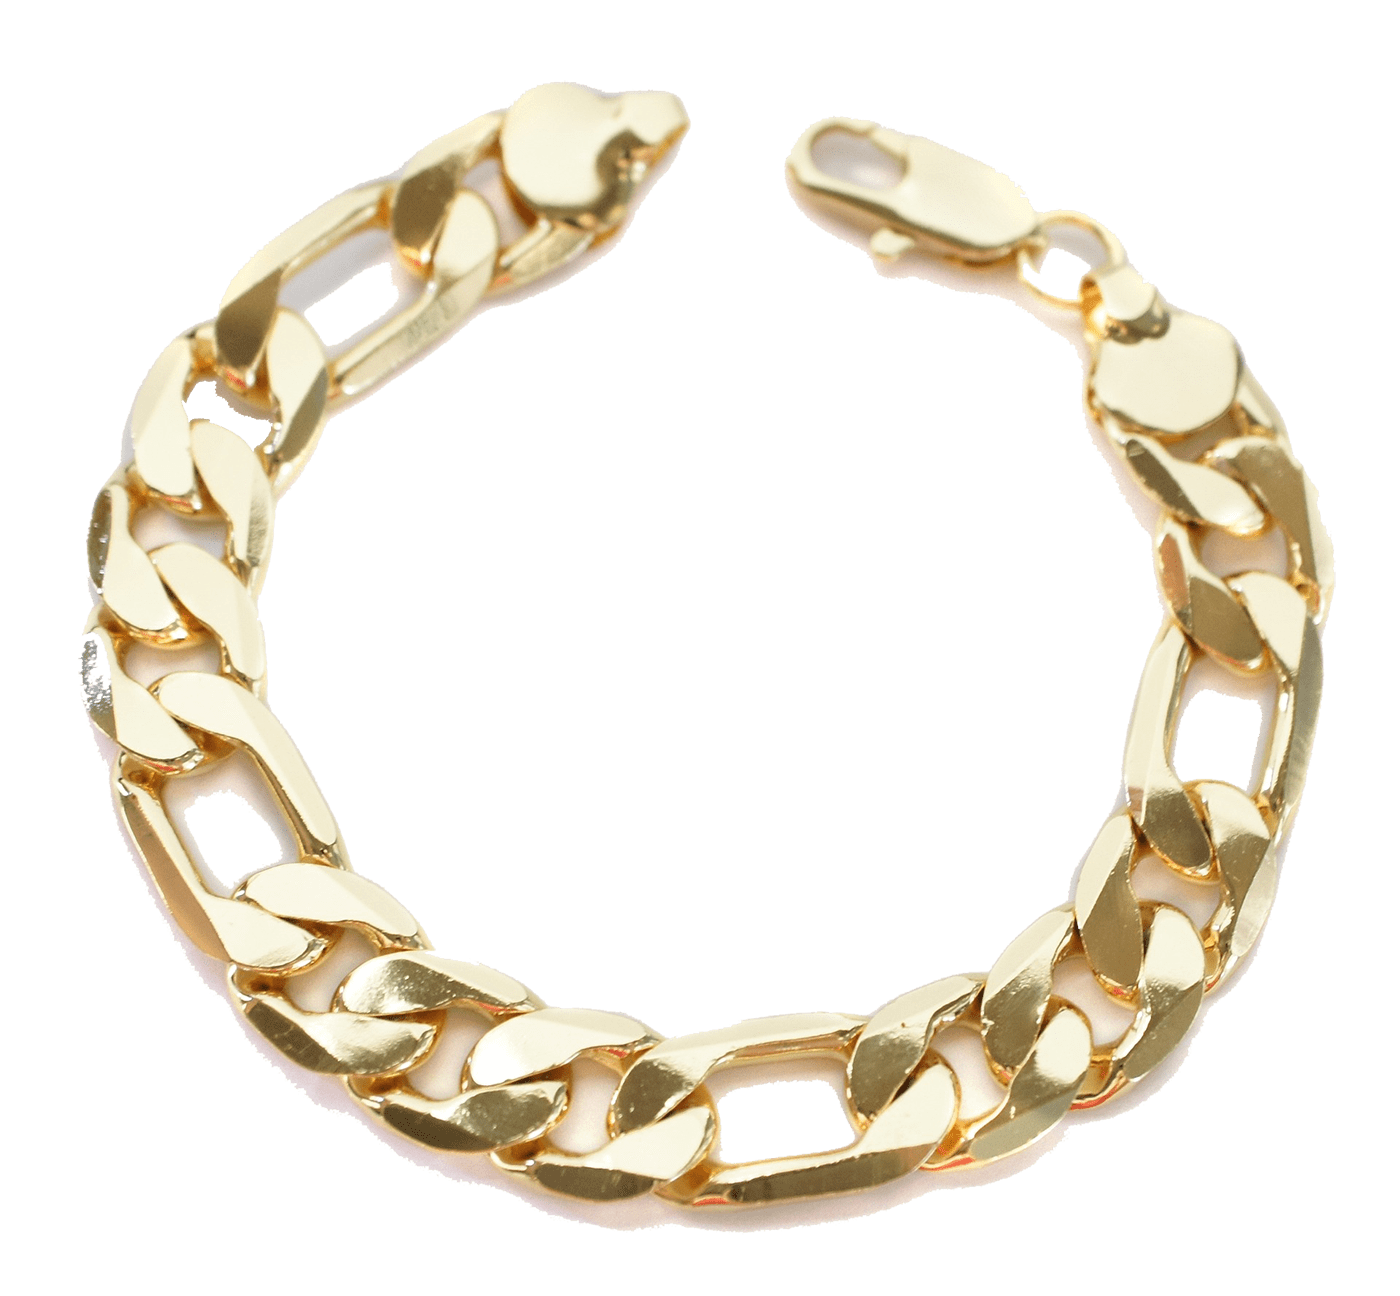 Artisan Jewelry Maker Website Template 7